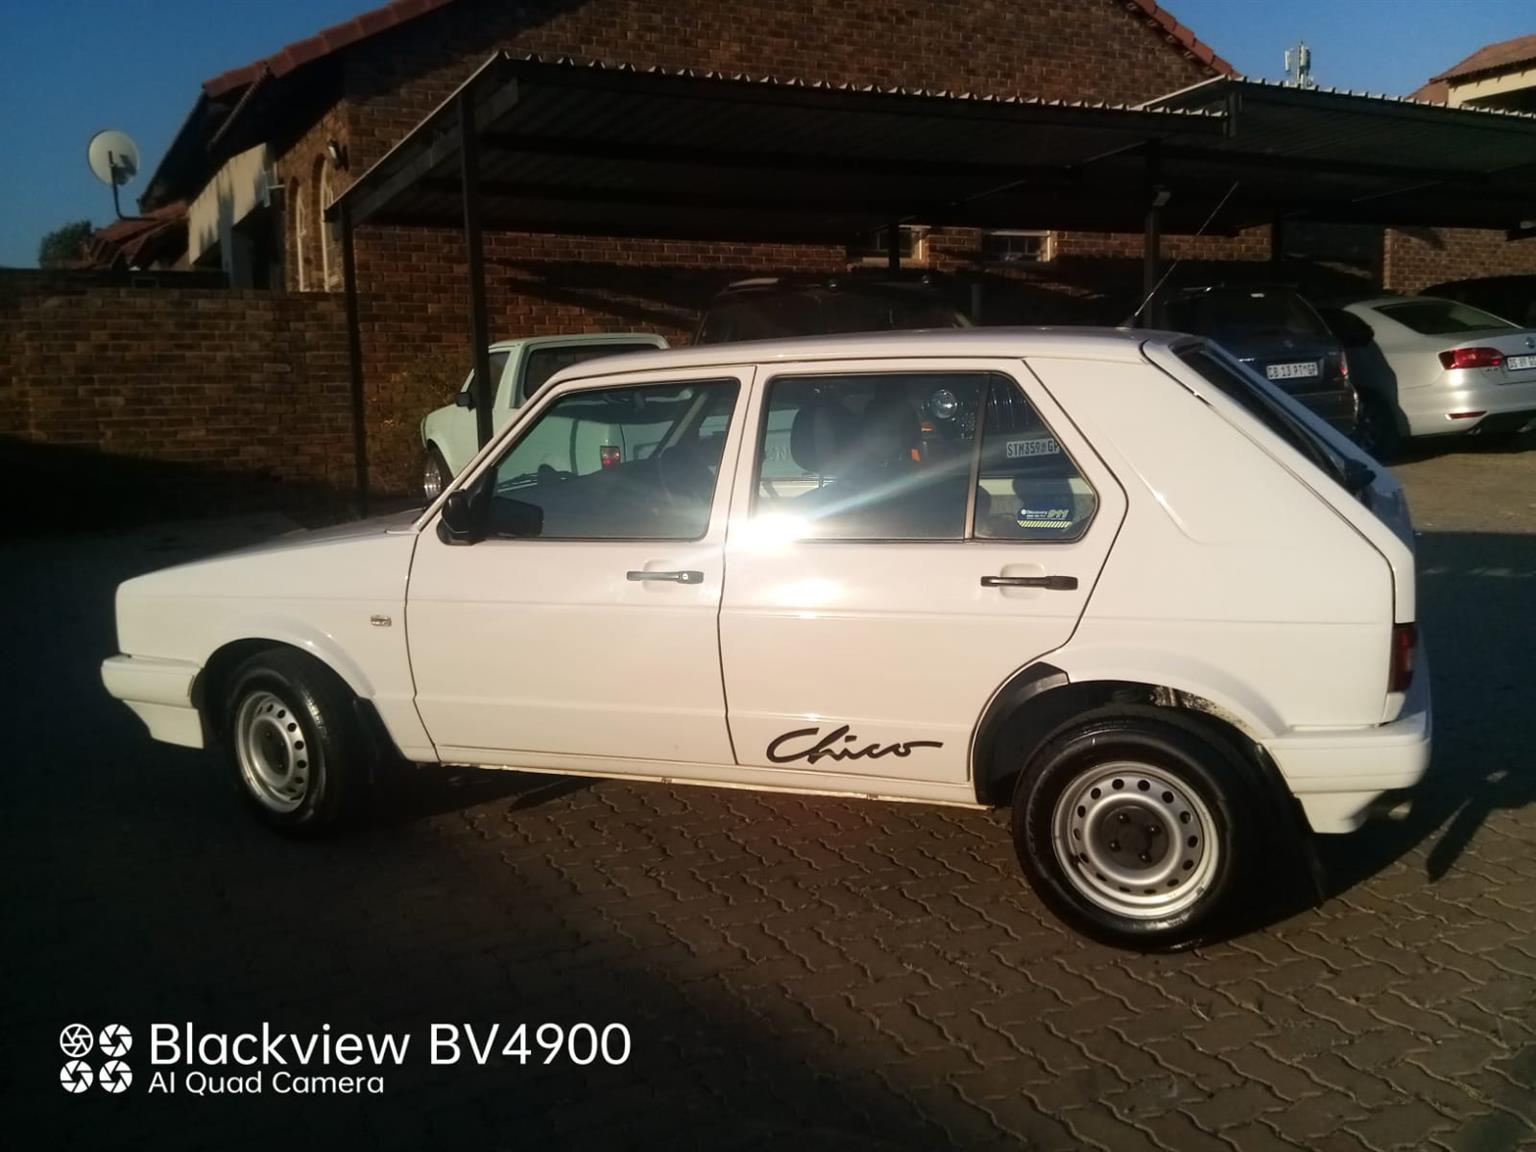 Volkswagen chico 1.4 for sale